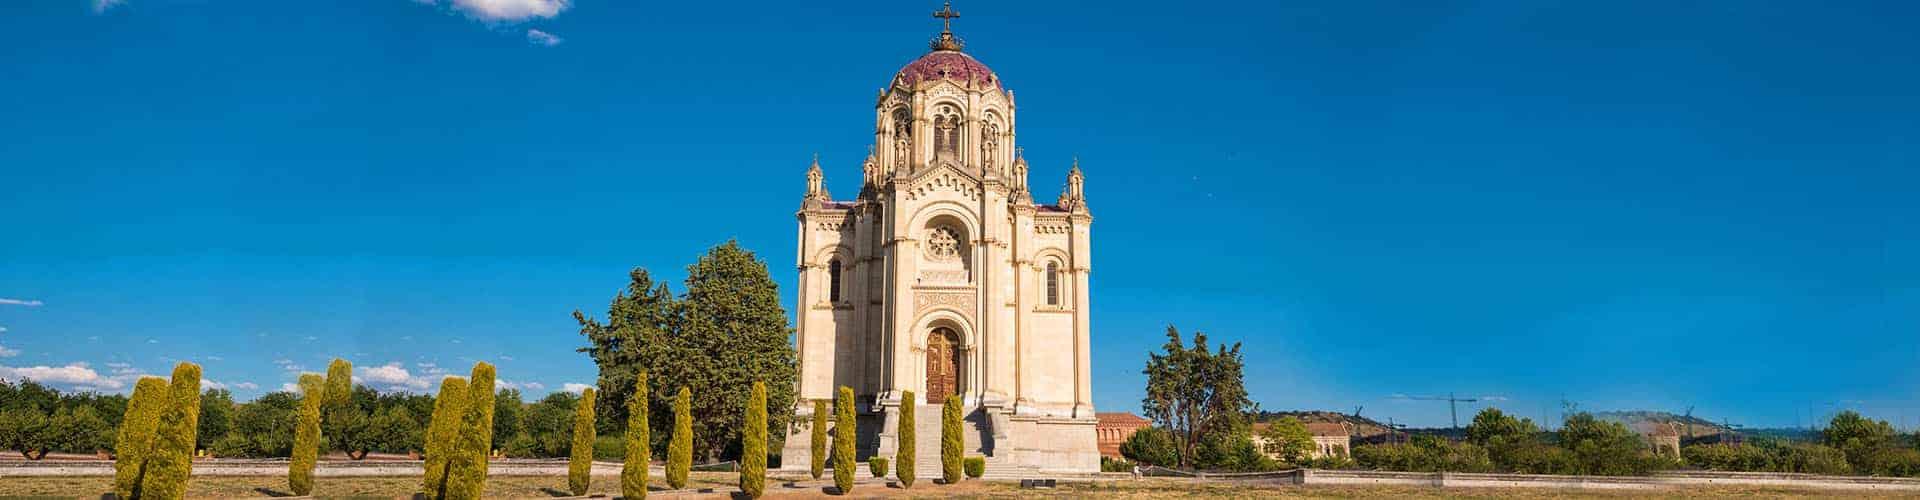 Free tour Guadalajara - Turismo en España